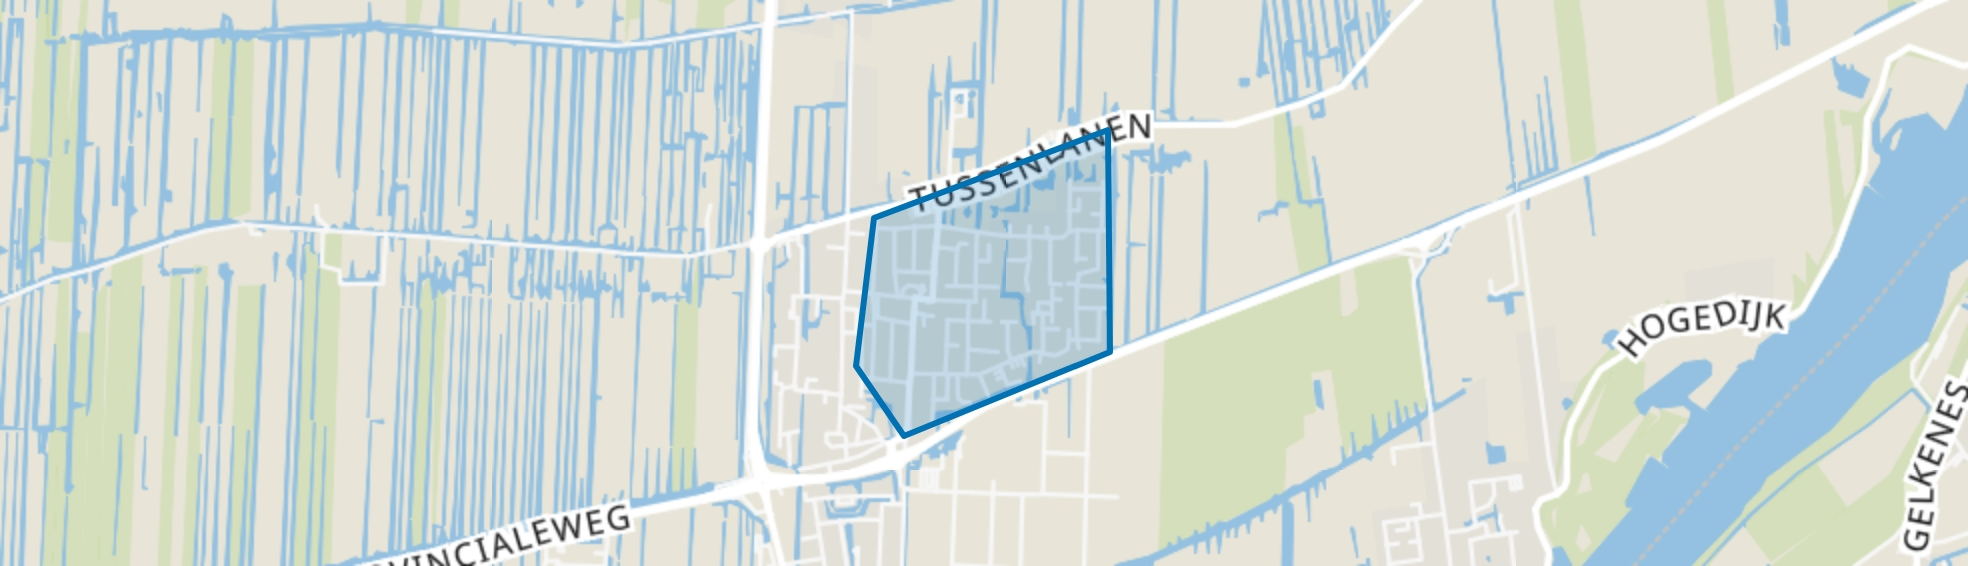 Uitbreiding Dorp, Bergambacht map